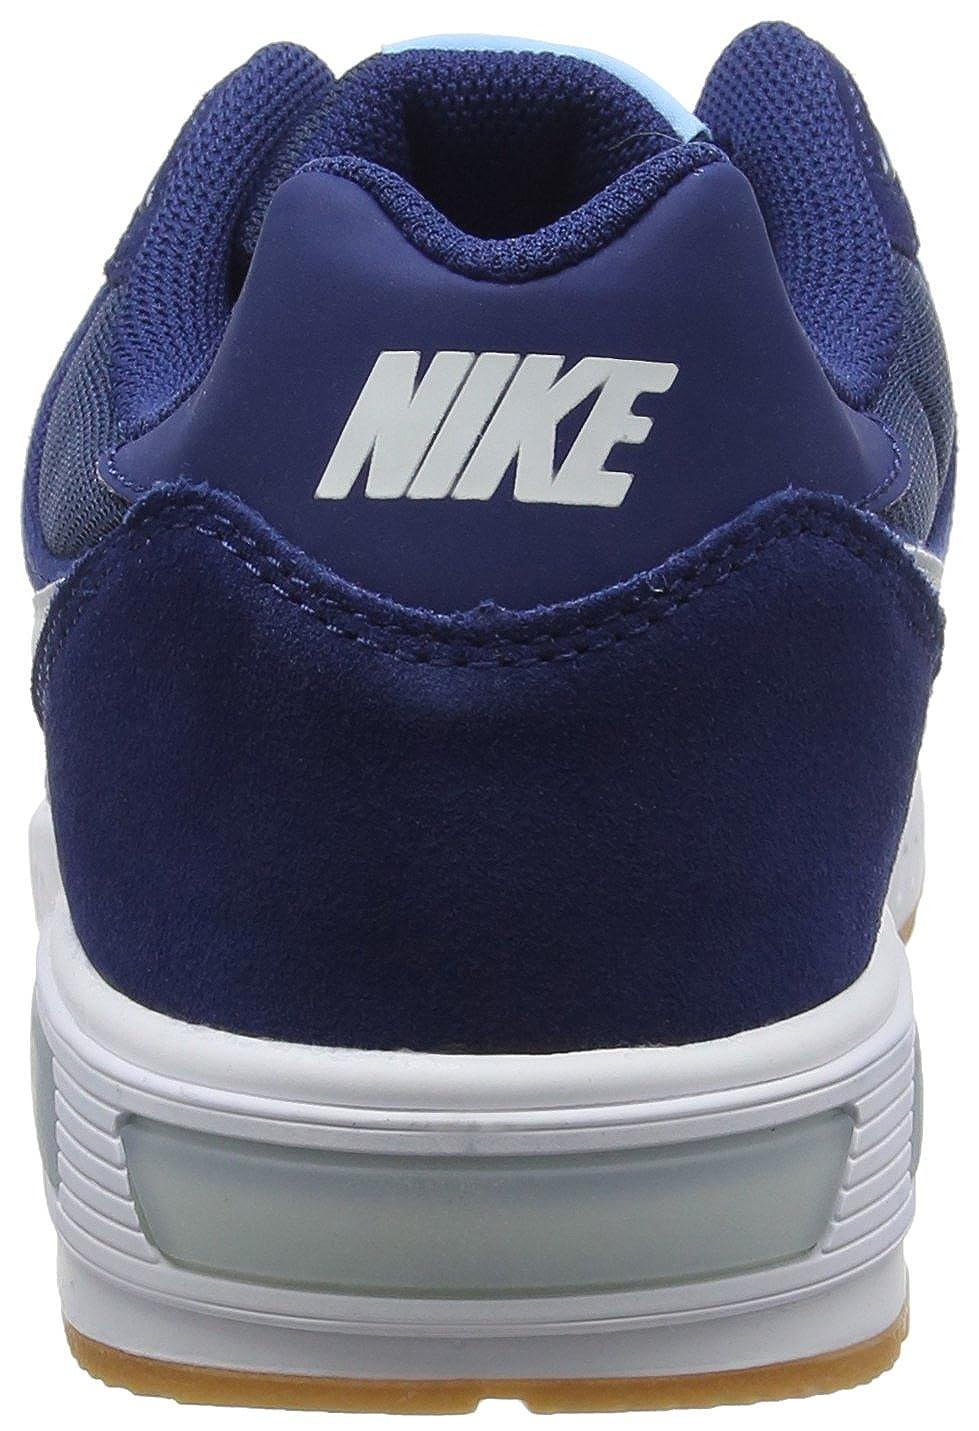 Nike Unisex-Erwachsene Nightgazer Nightgazer Nightgazer 644402-412 Turnschuhe  458b35